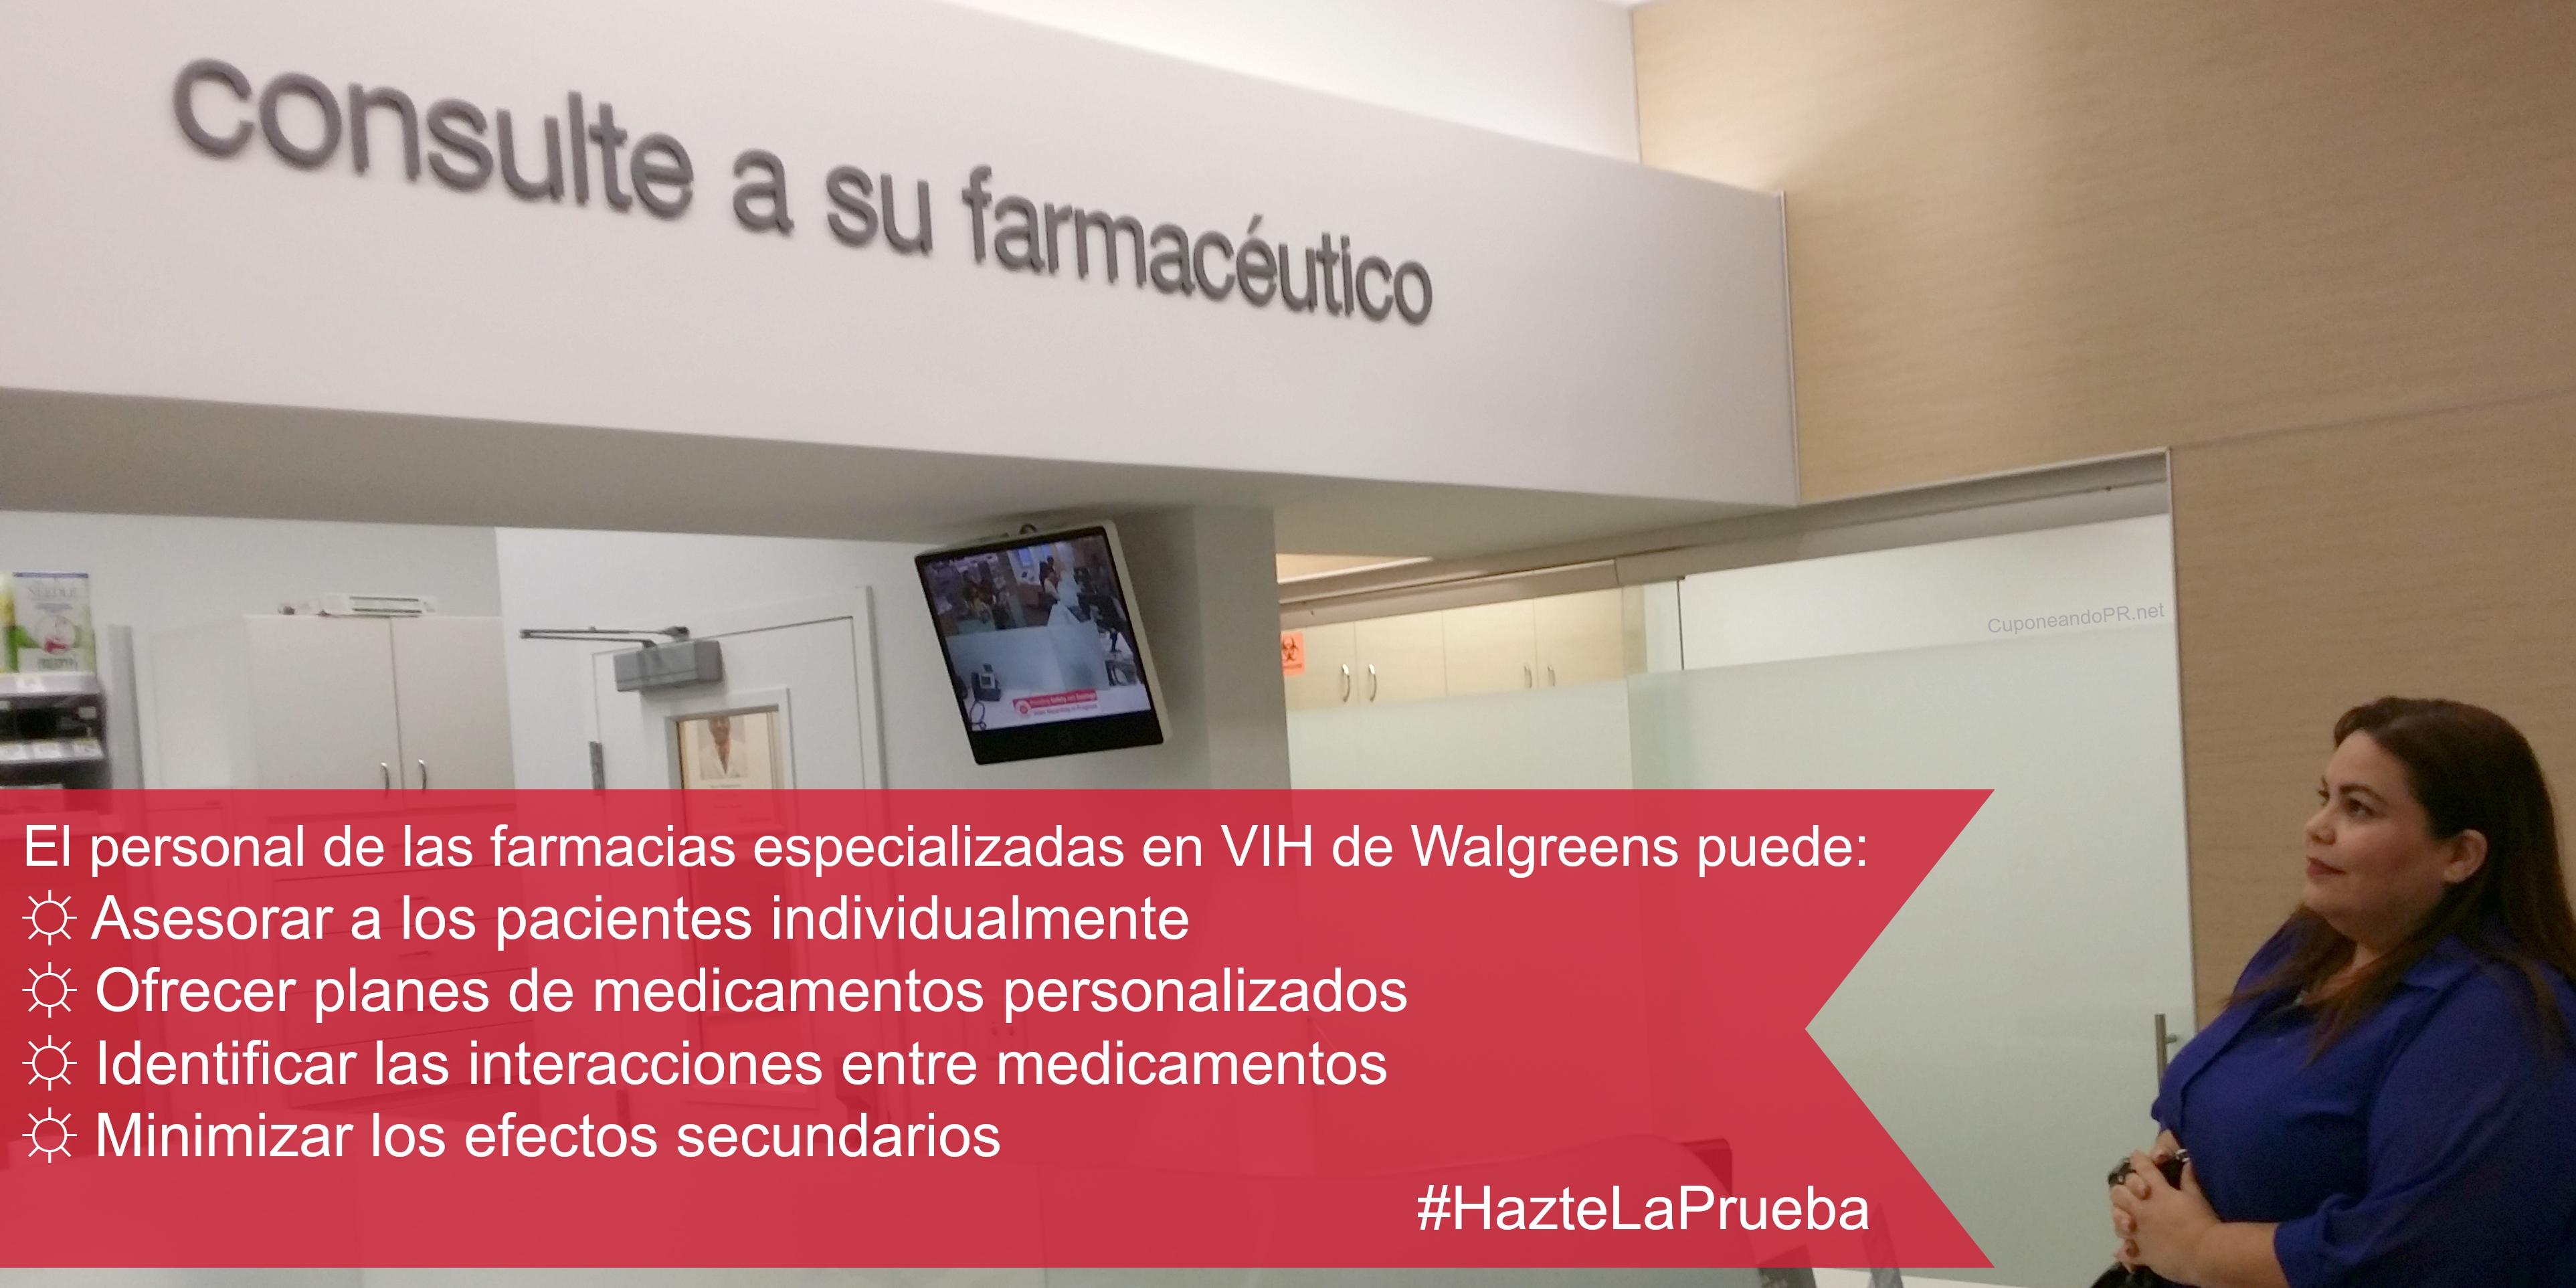 #HazteLaPrueba del VIH / SIDA